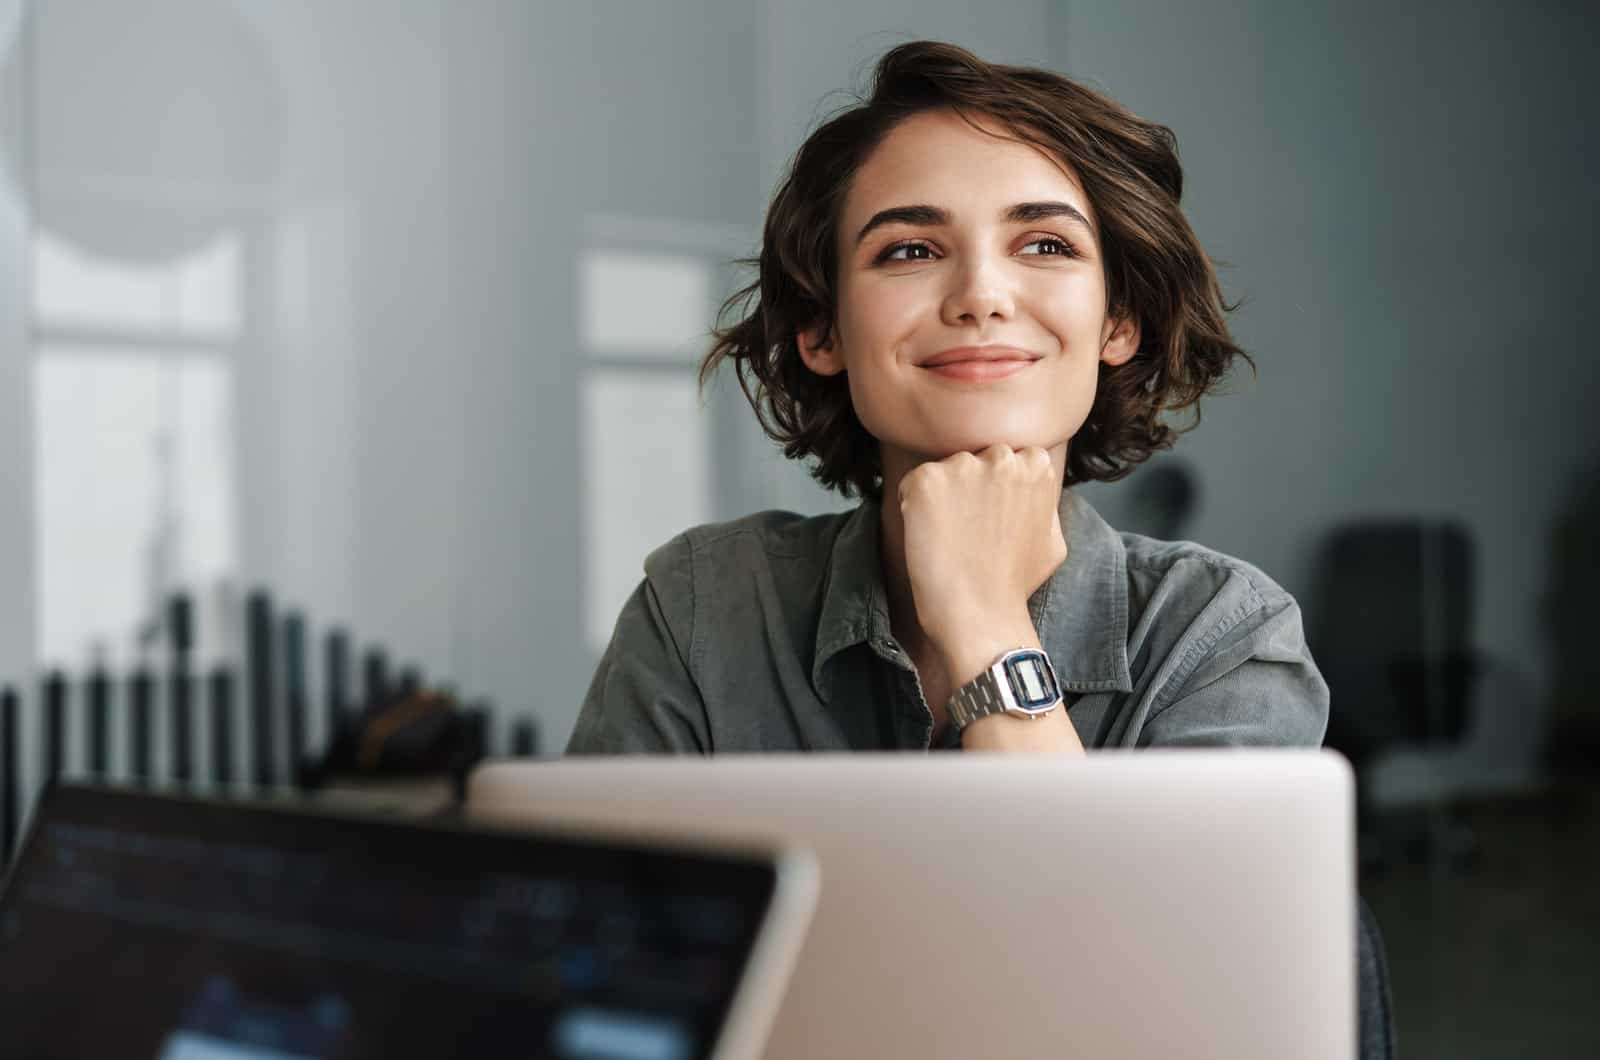 junge Frau am Laptop lächelnd